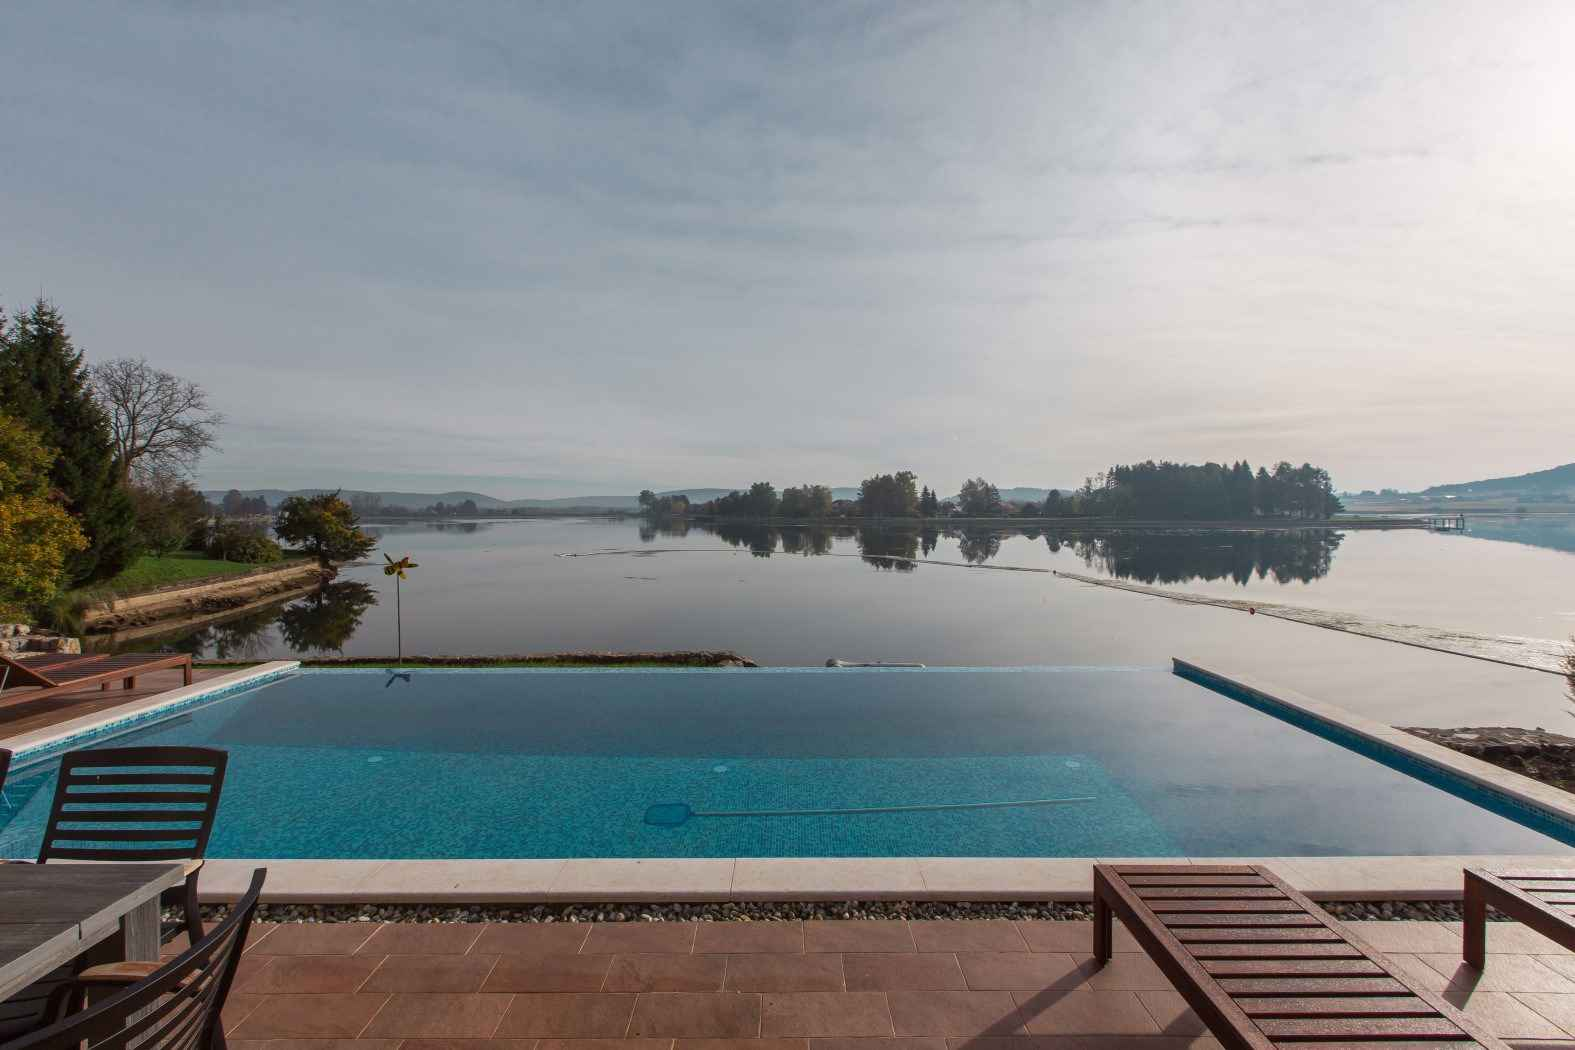 Ferienhaus mit Pool am See gelegen (2047240), Ogulin, , Mittelkroatien, Kroatien, Bild 9